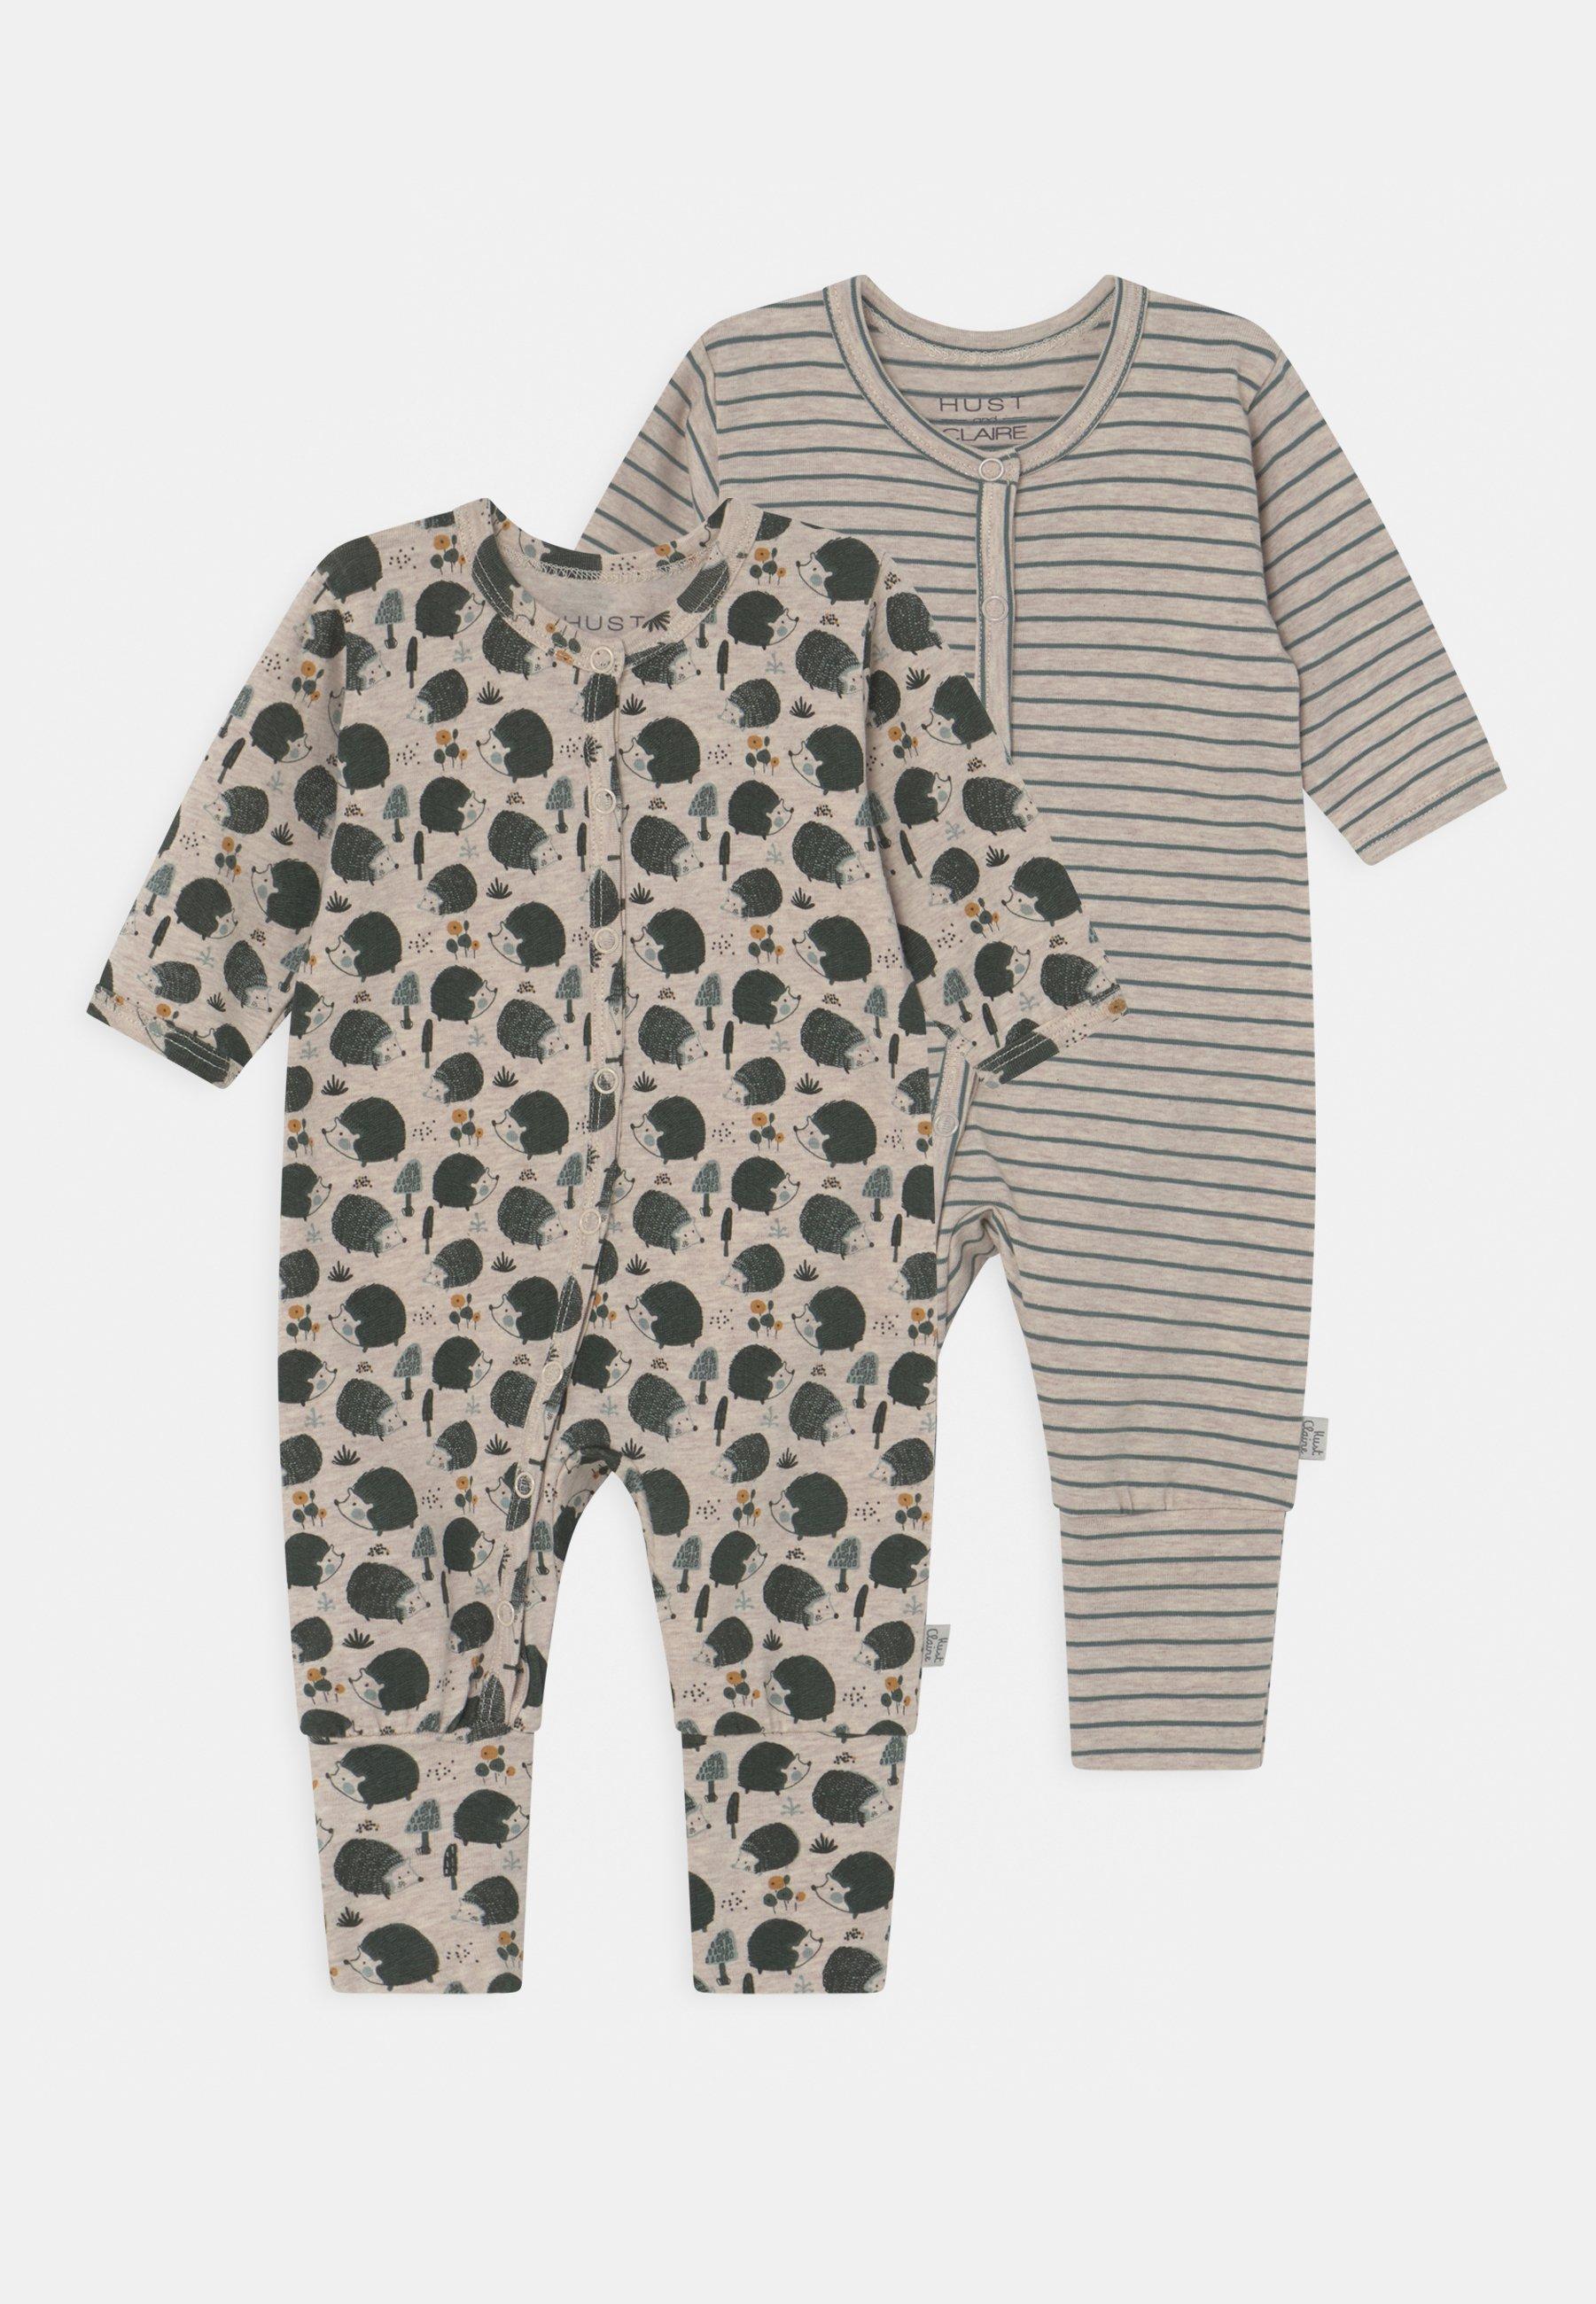 Kinder IDUN NIGHTSUIT 2 PACK - Pyjama